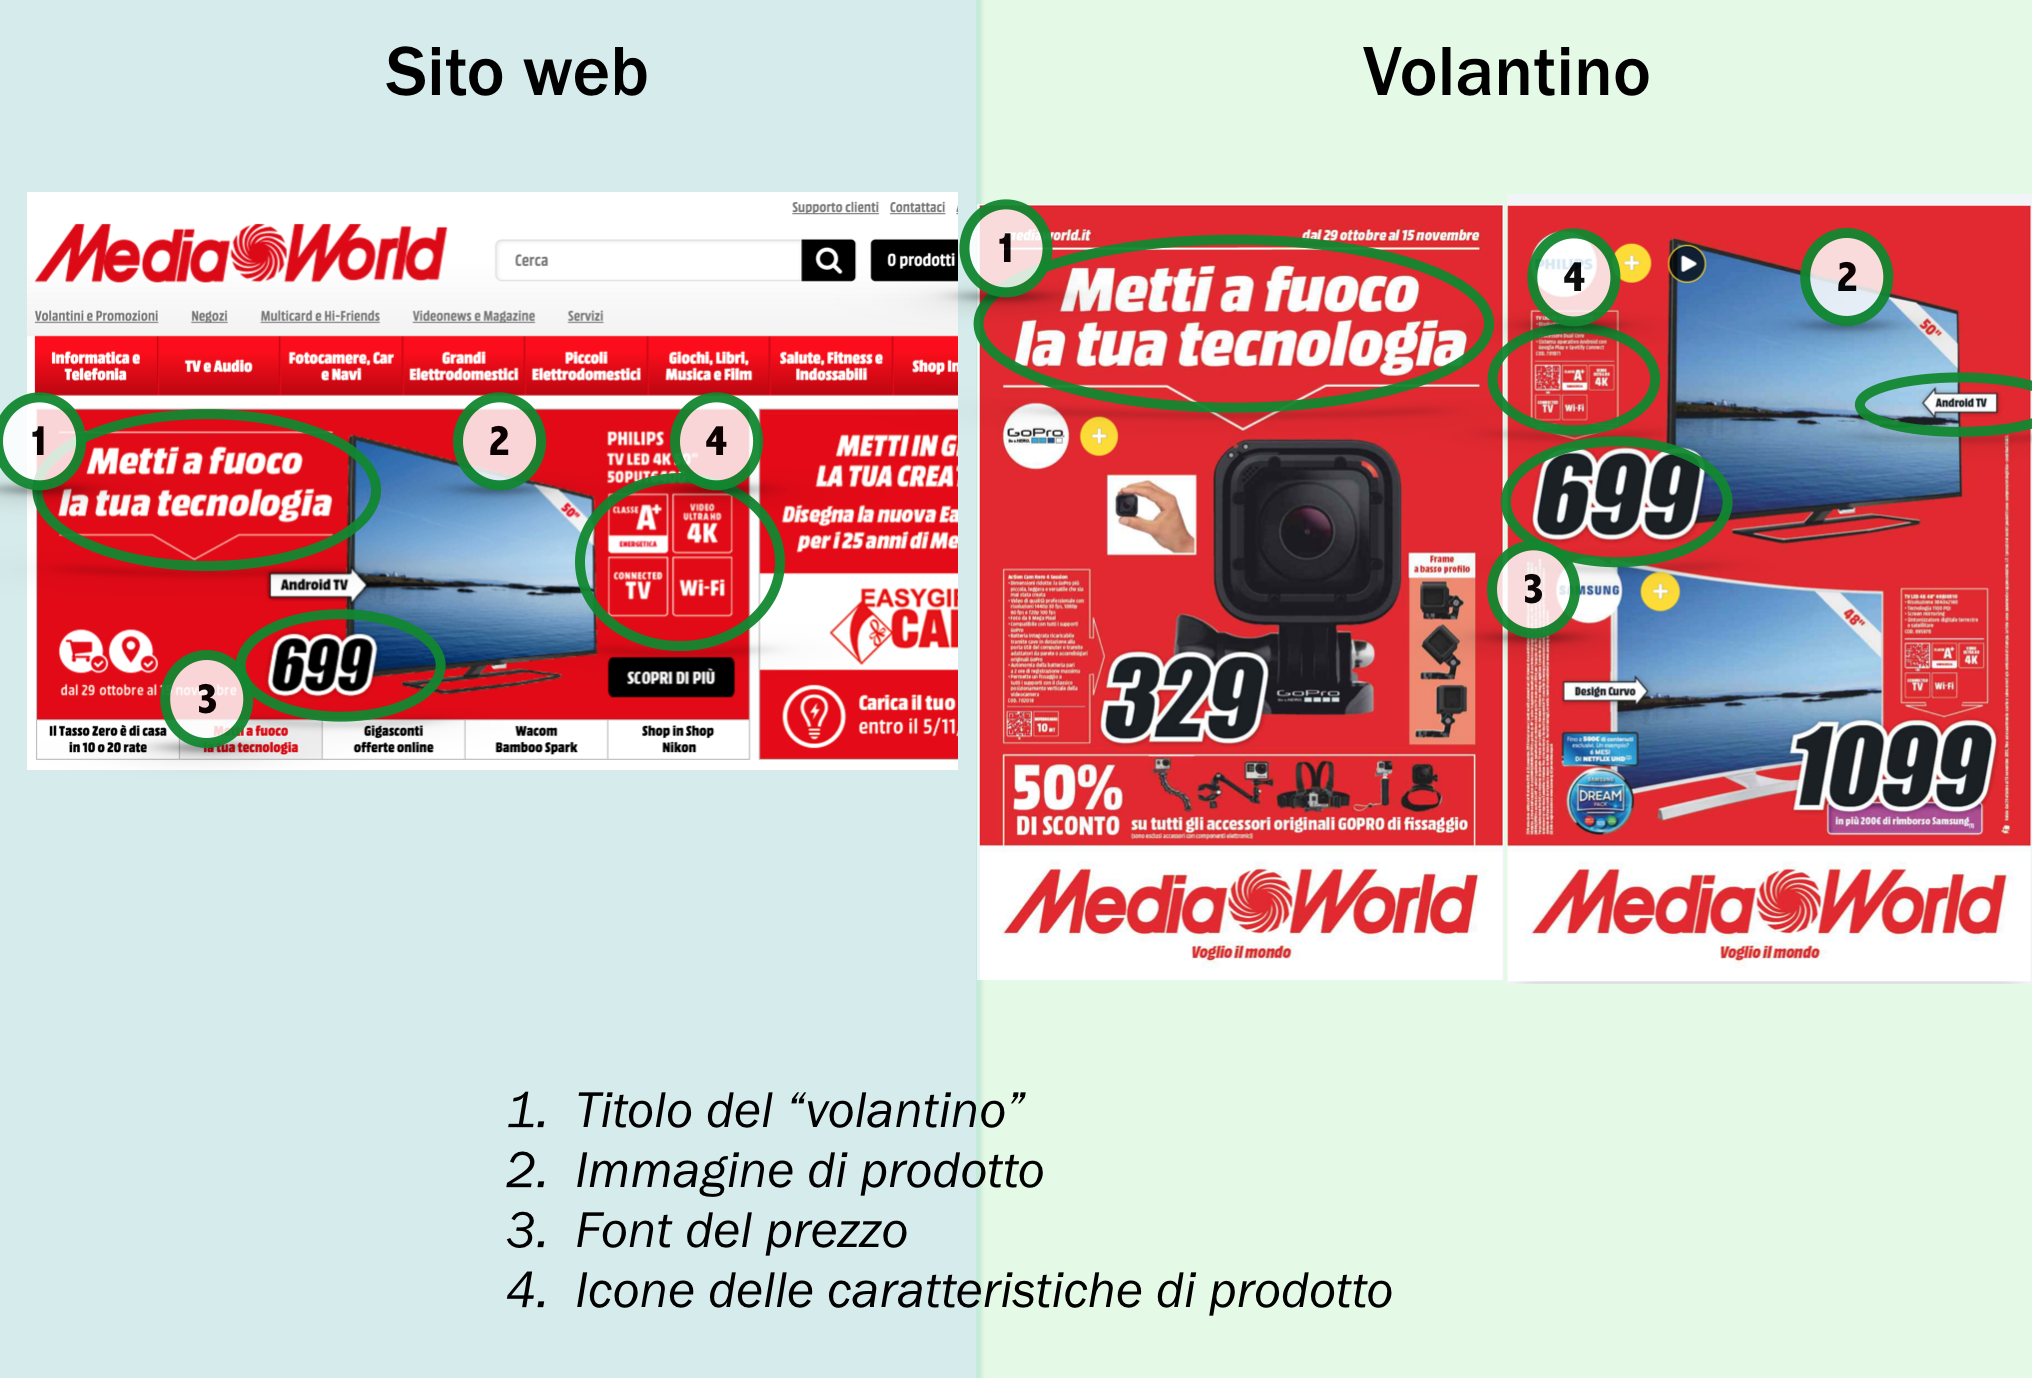 coerenza-ecommerce-offline-volantino-mediaworld